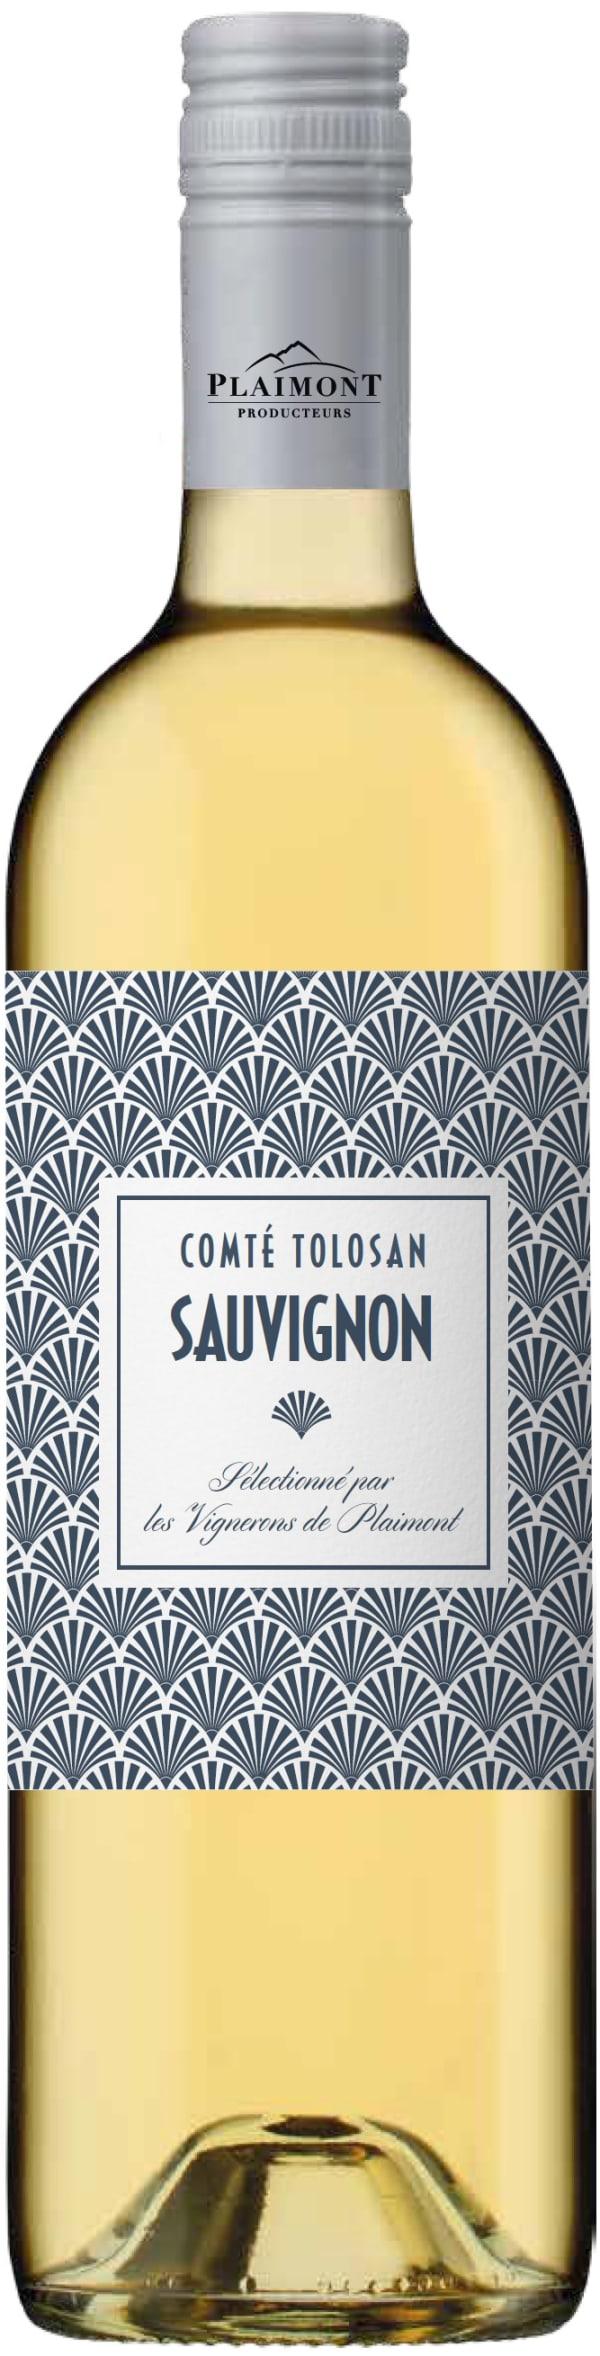 Plaimont Sauvignon 2017